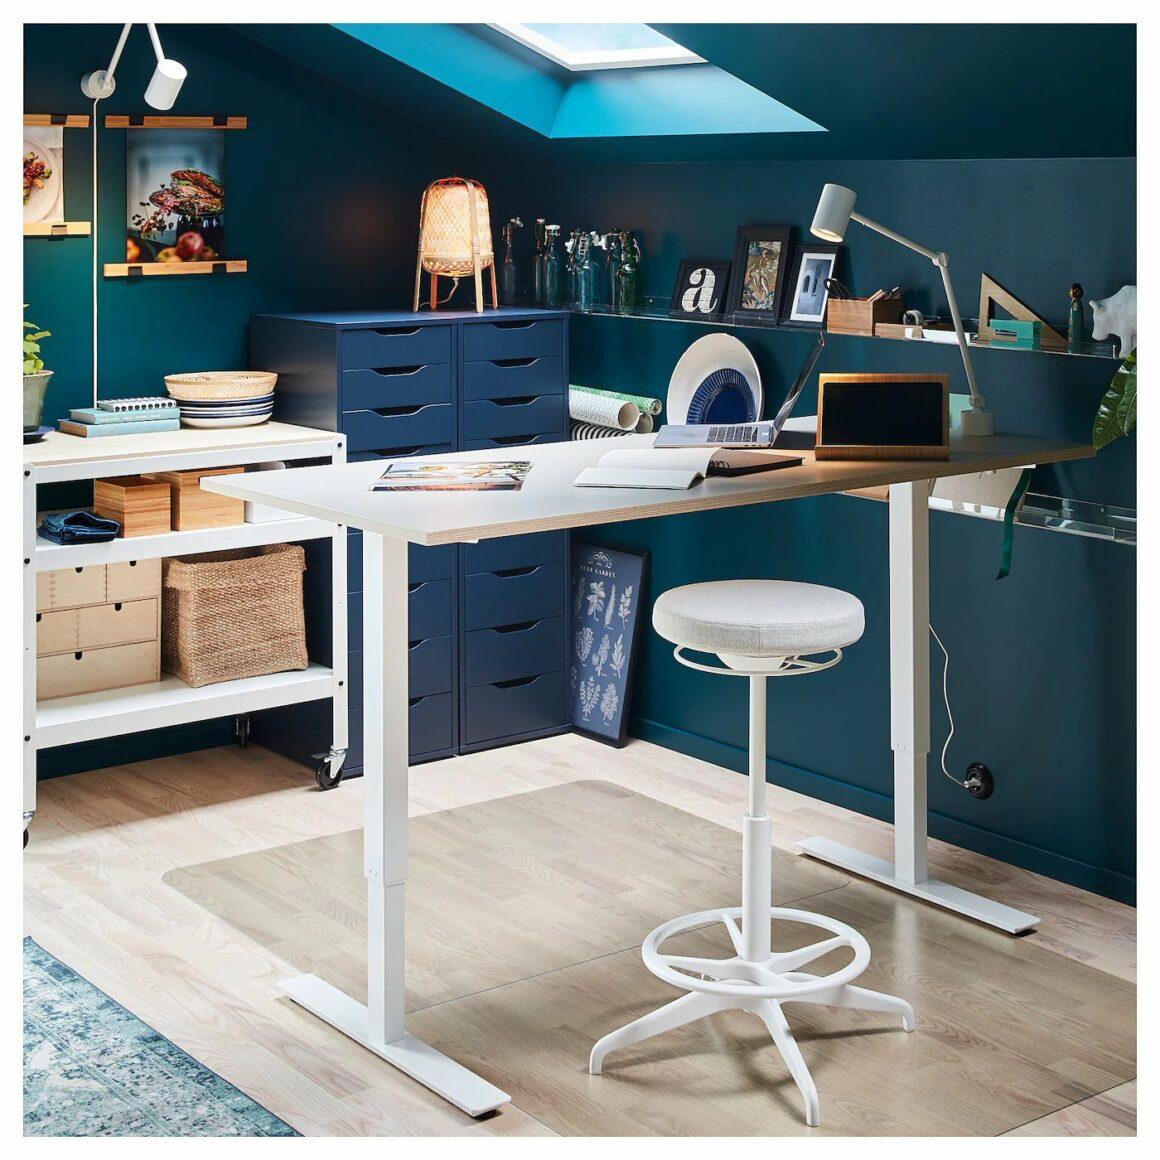 Best Minimalist Standing Desks & Desk Converters - Ikea SKARSTA Standing Desk